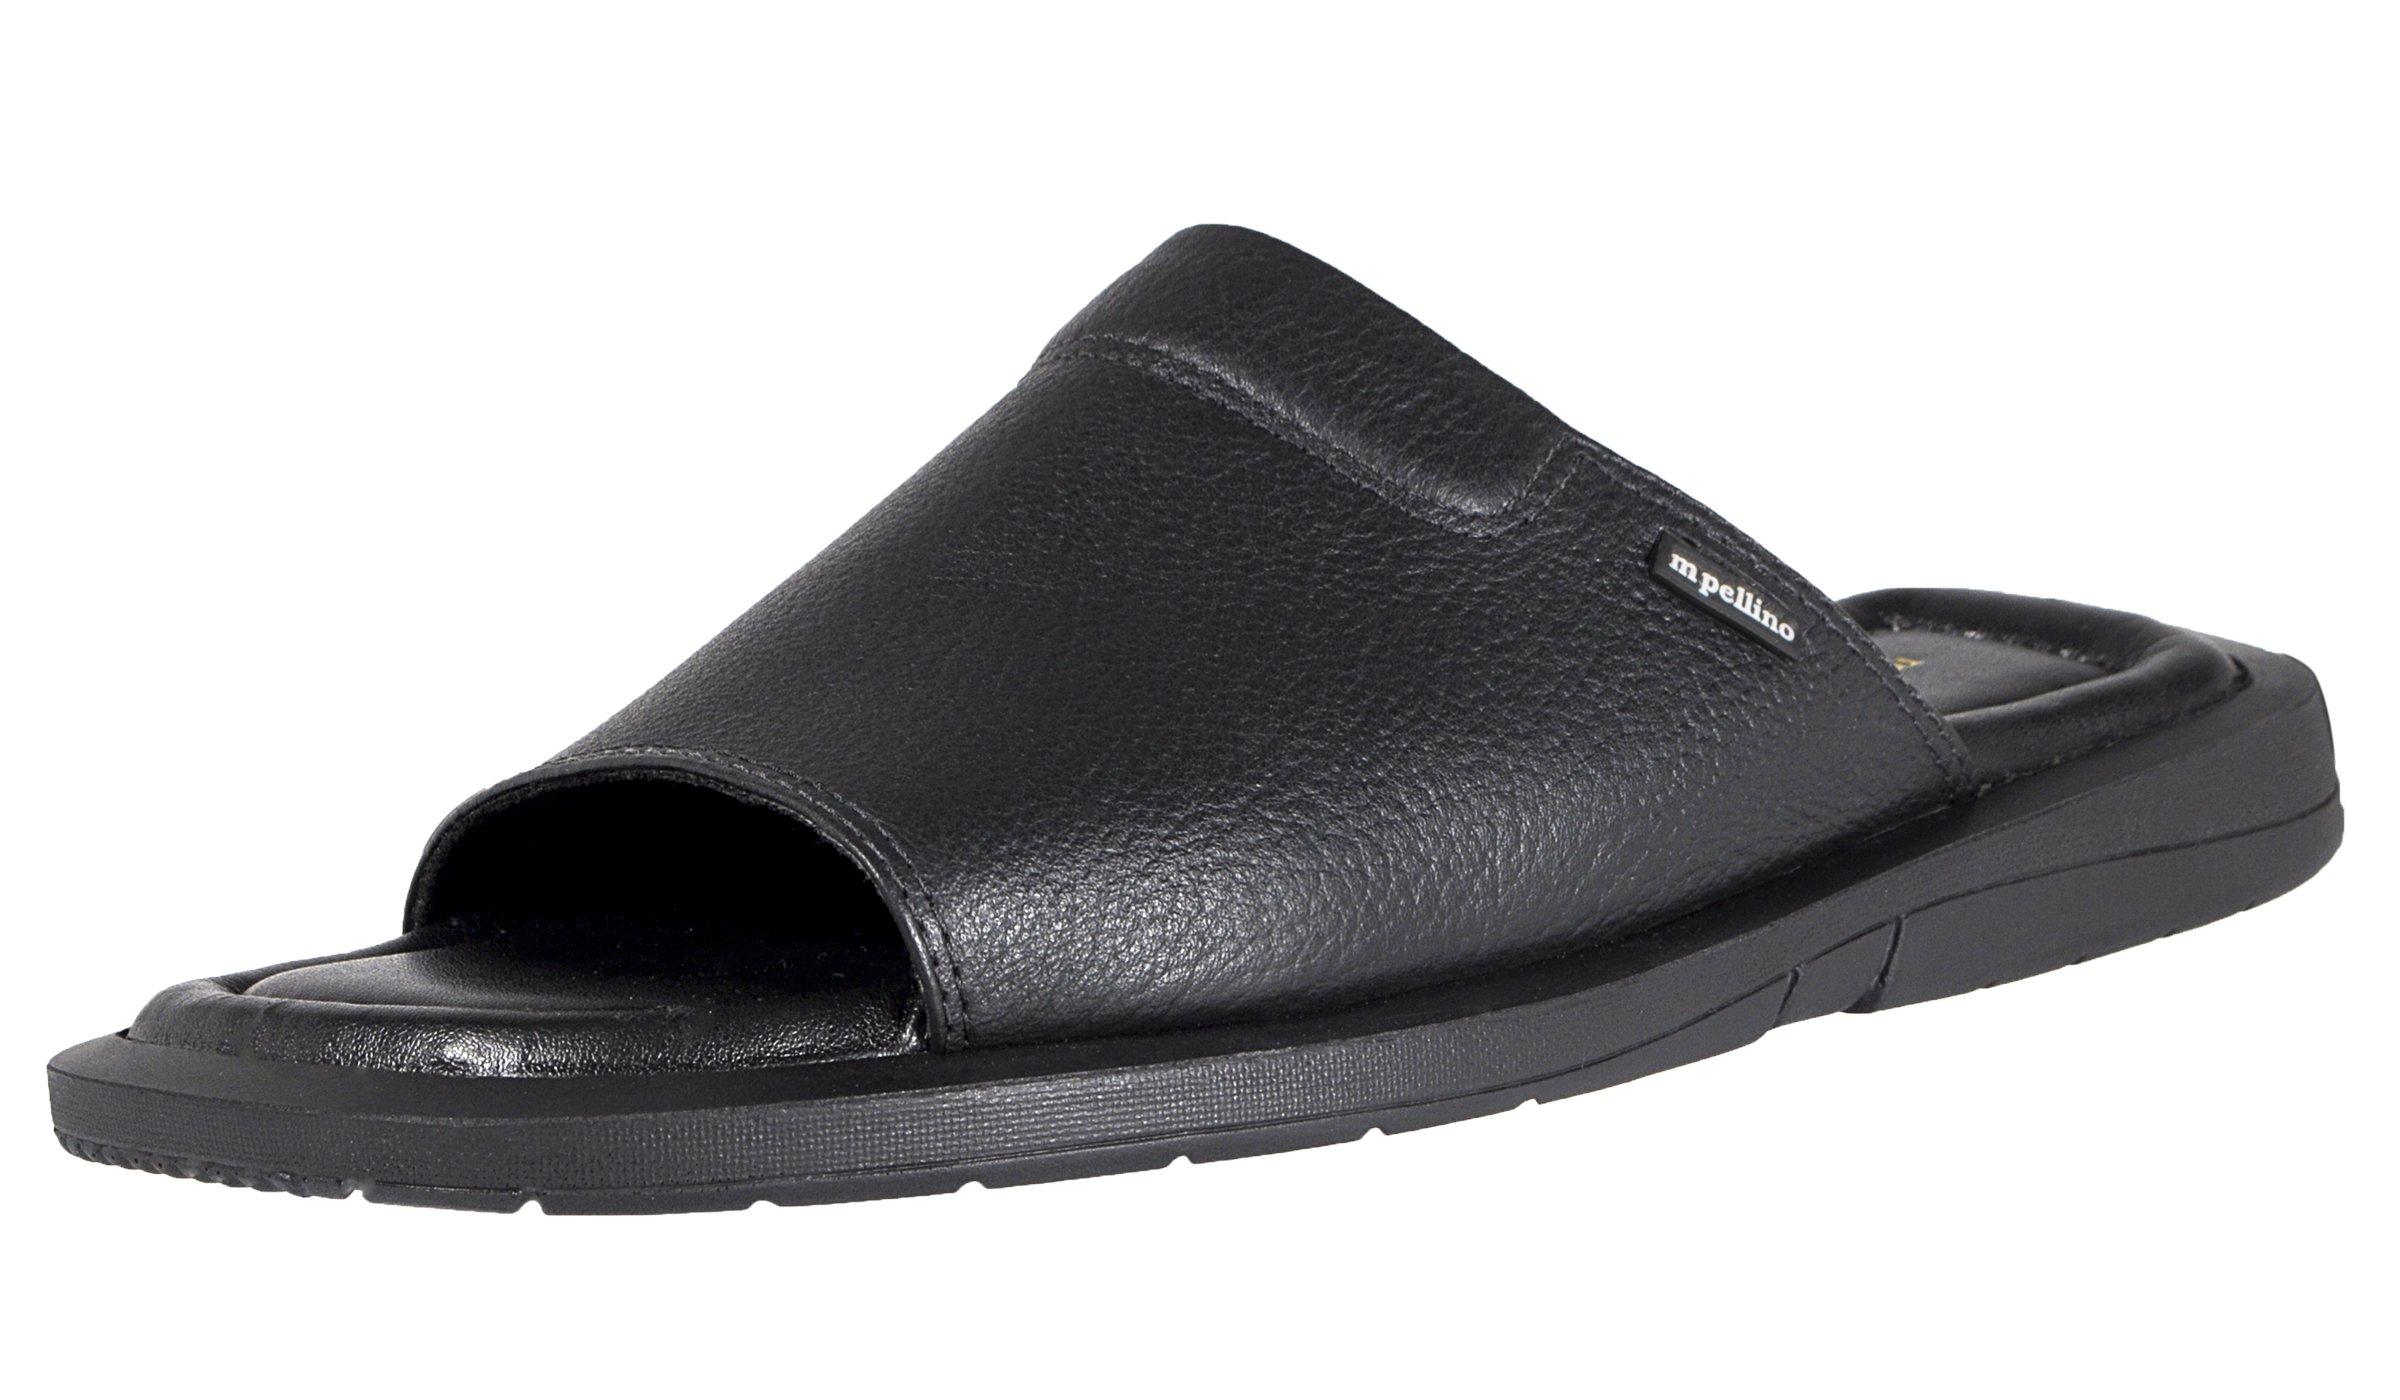 Mario Pellino Mens Casual Sandals Handmade Genuine Leather Sandals for Mens (43 M EU/11-11.5 B(M) US, Black Fl)